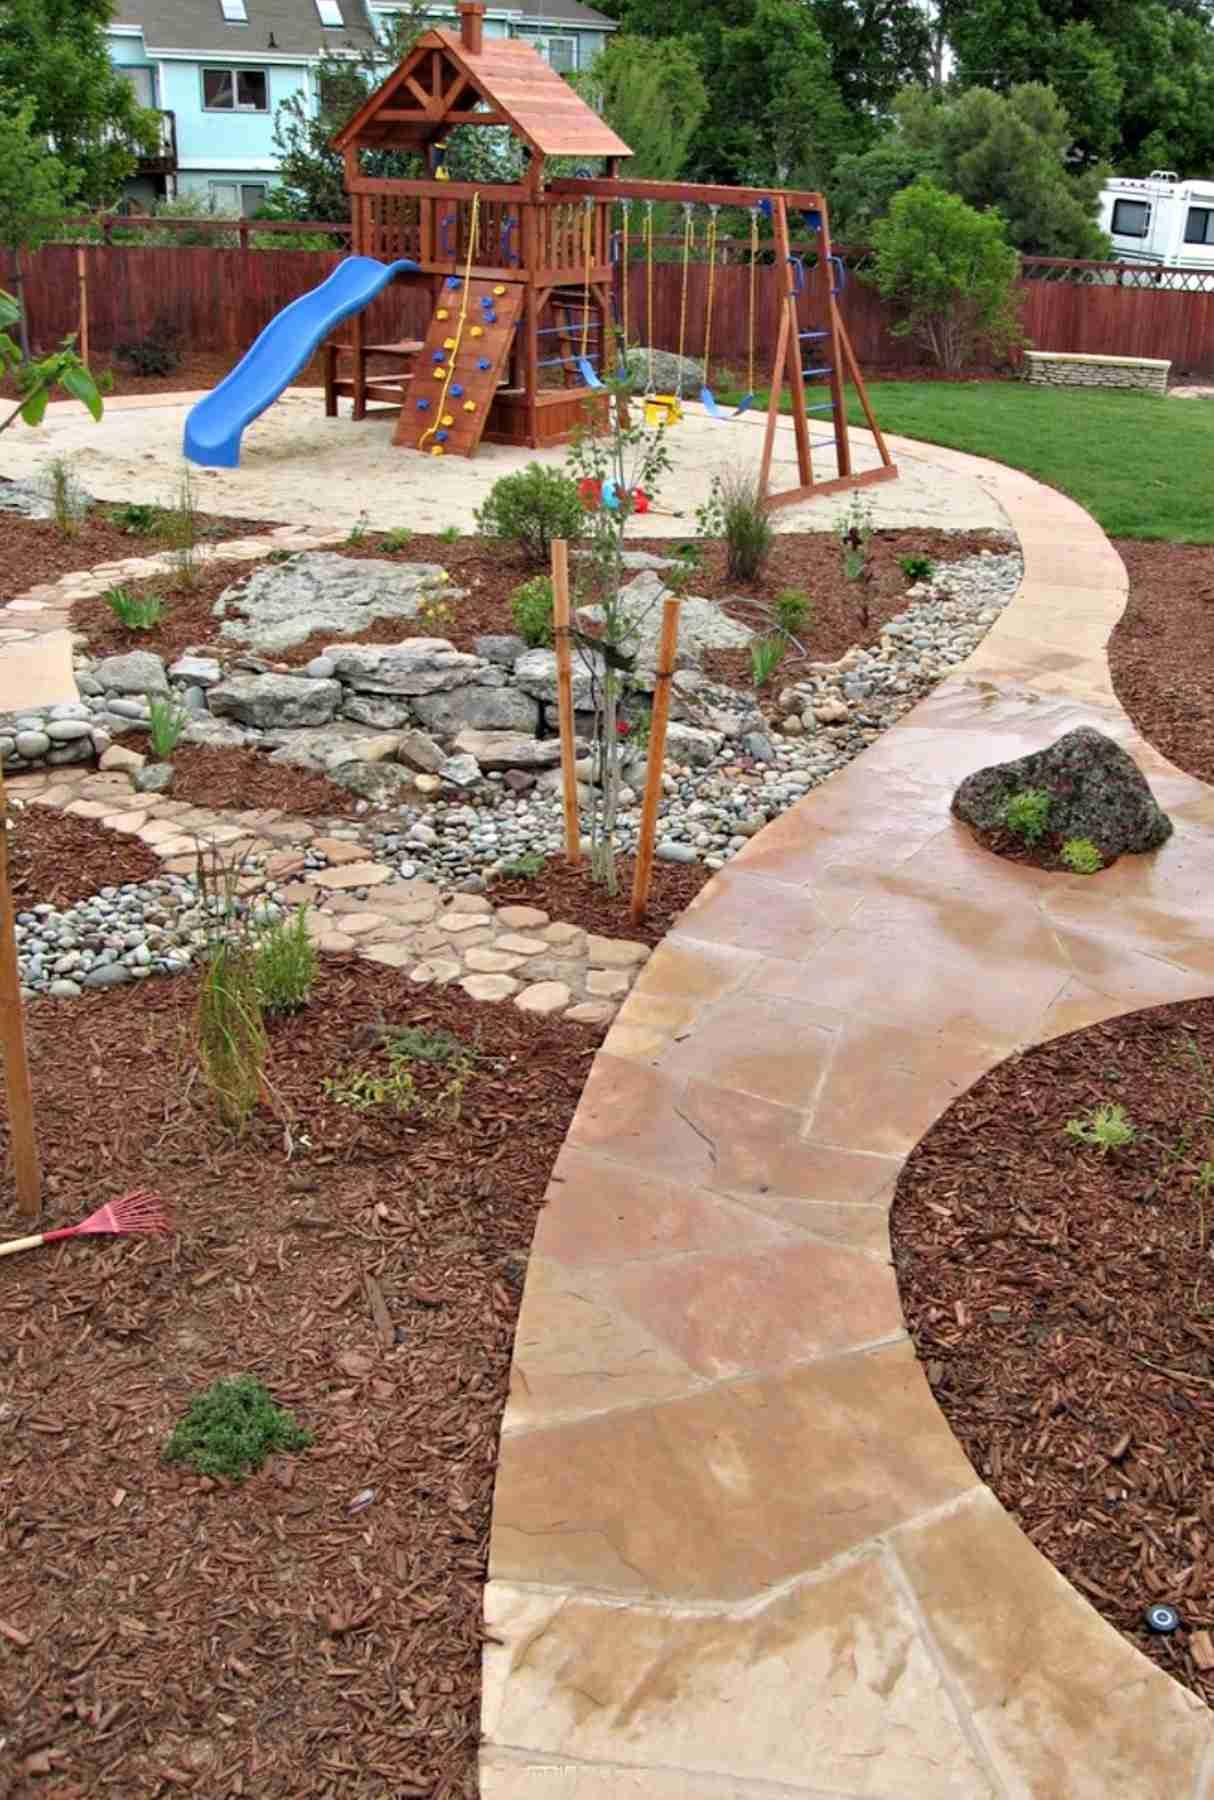 children's play area in garden